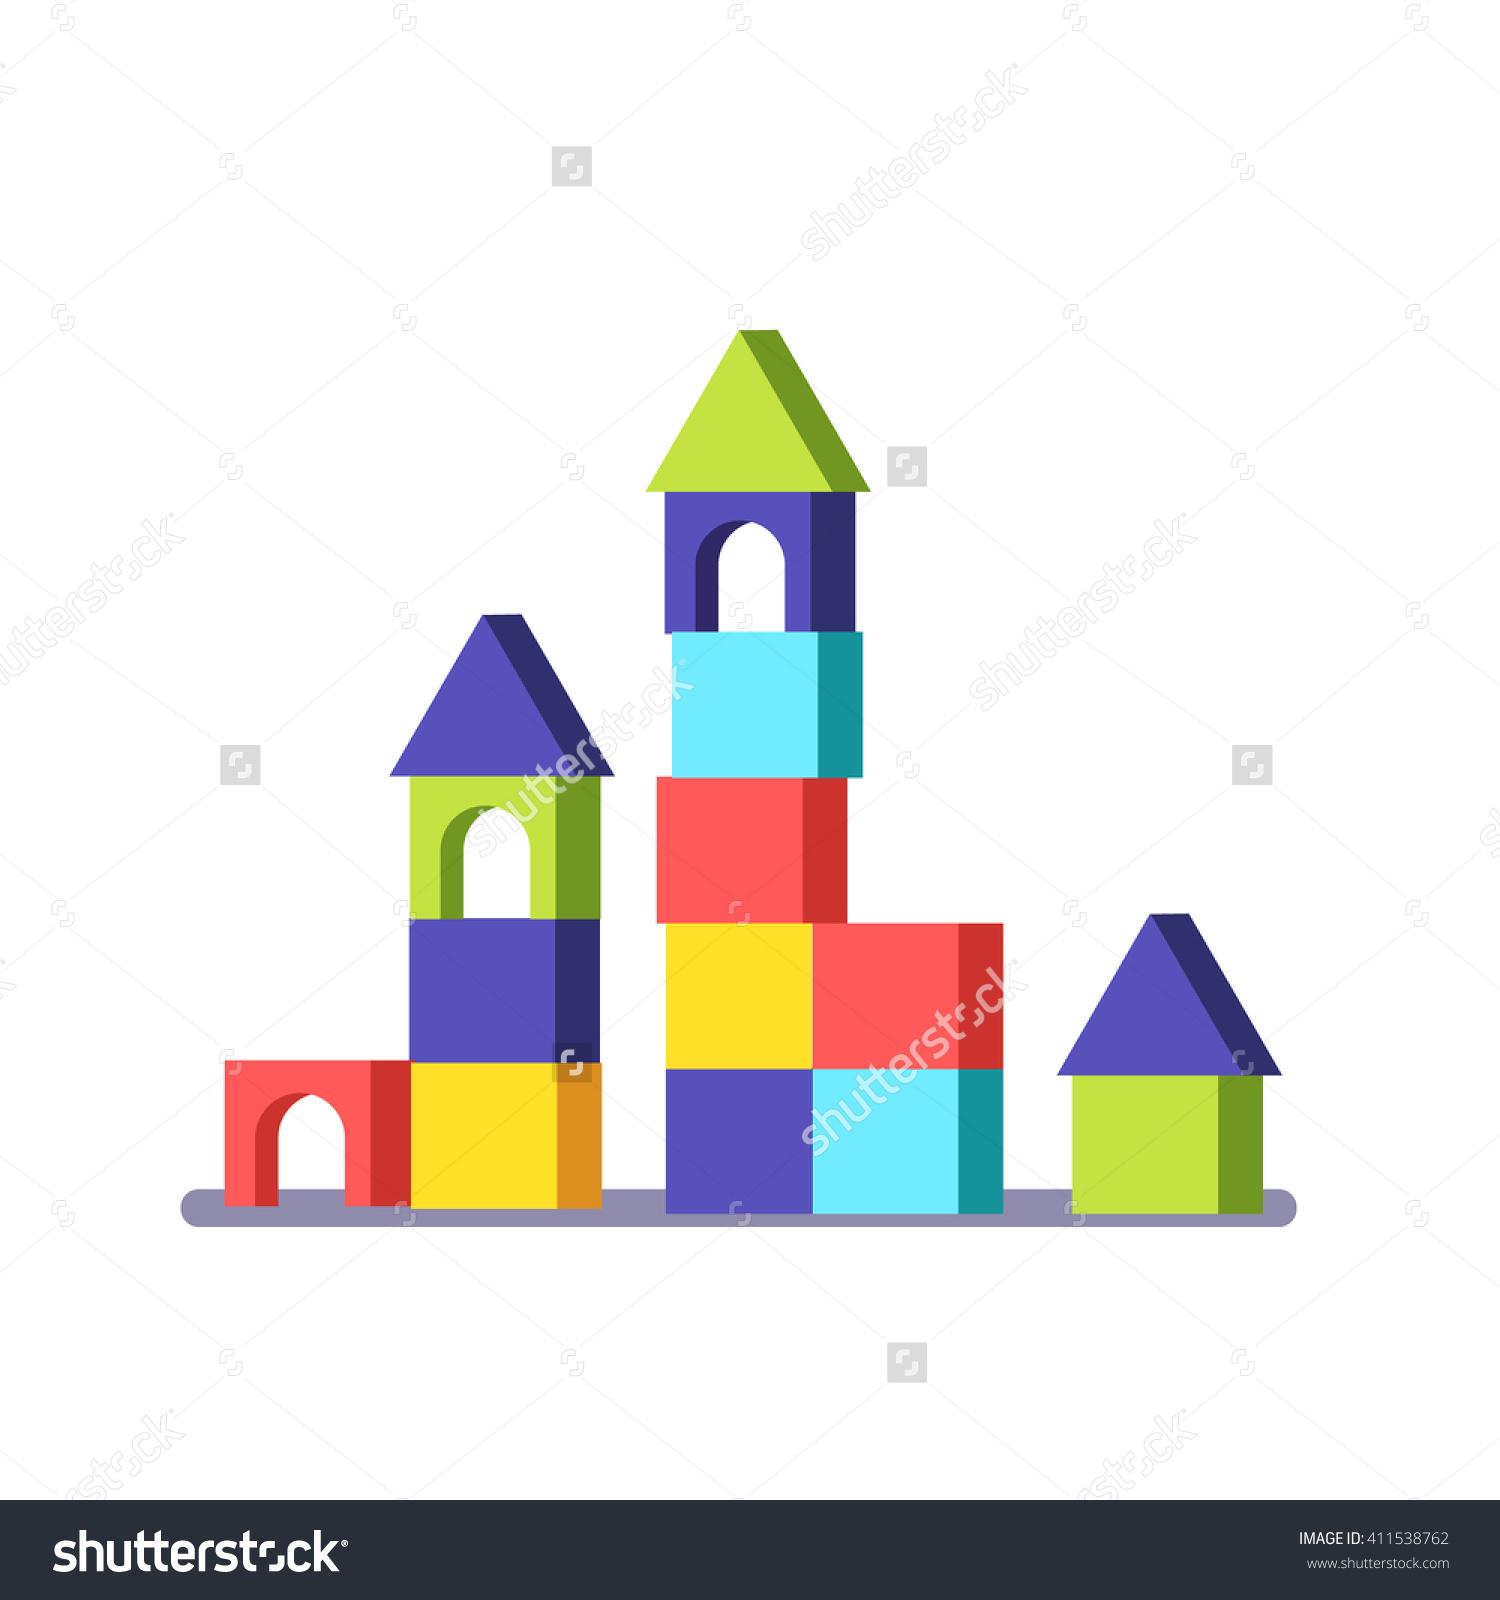 Building blocks game clipart svg download Wooden Block Building Game Castle Modern Stock Vector 411538762 ... svg download